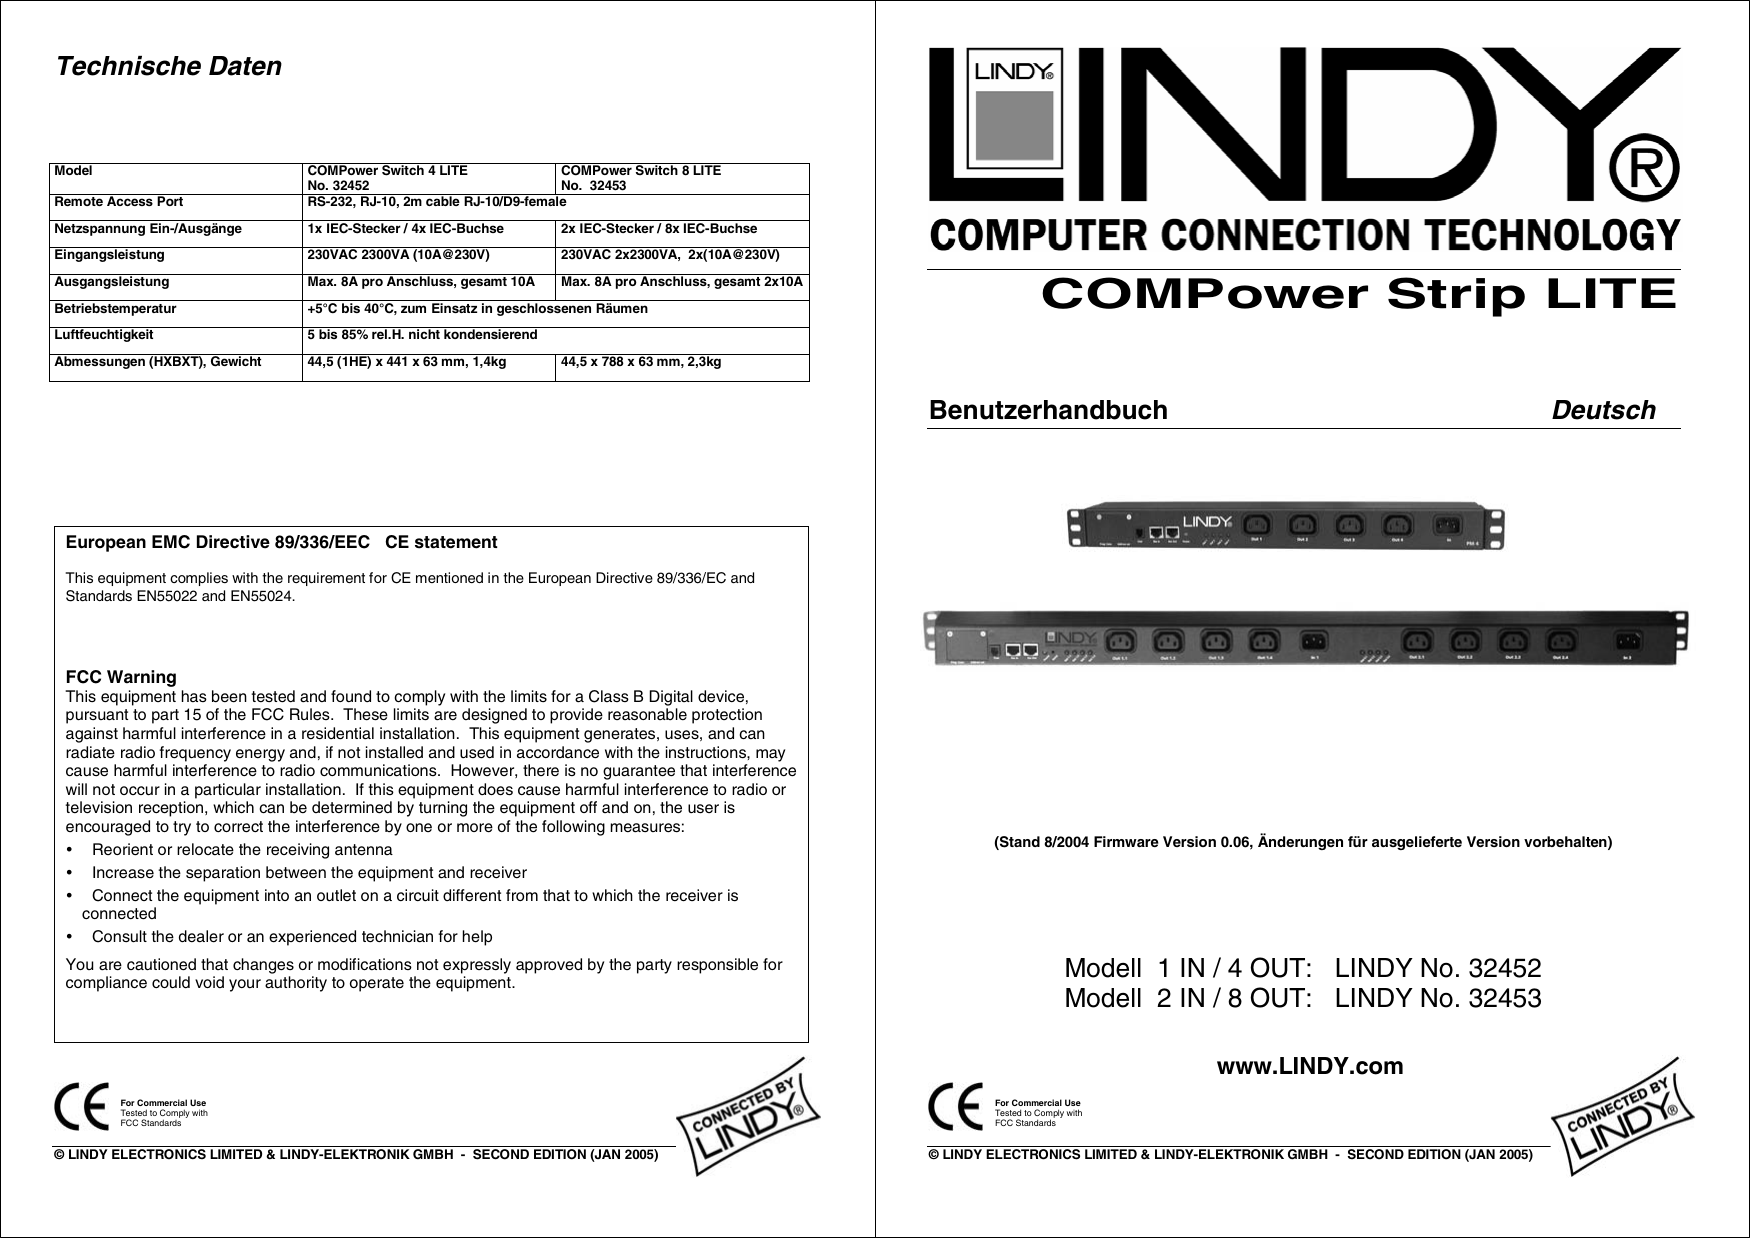 Lindy Compower Strip Lite 32452 Users Manual 32452_3v1GERMAN